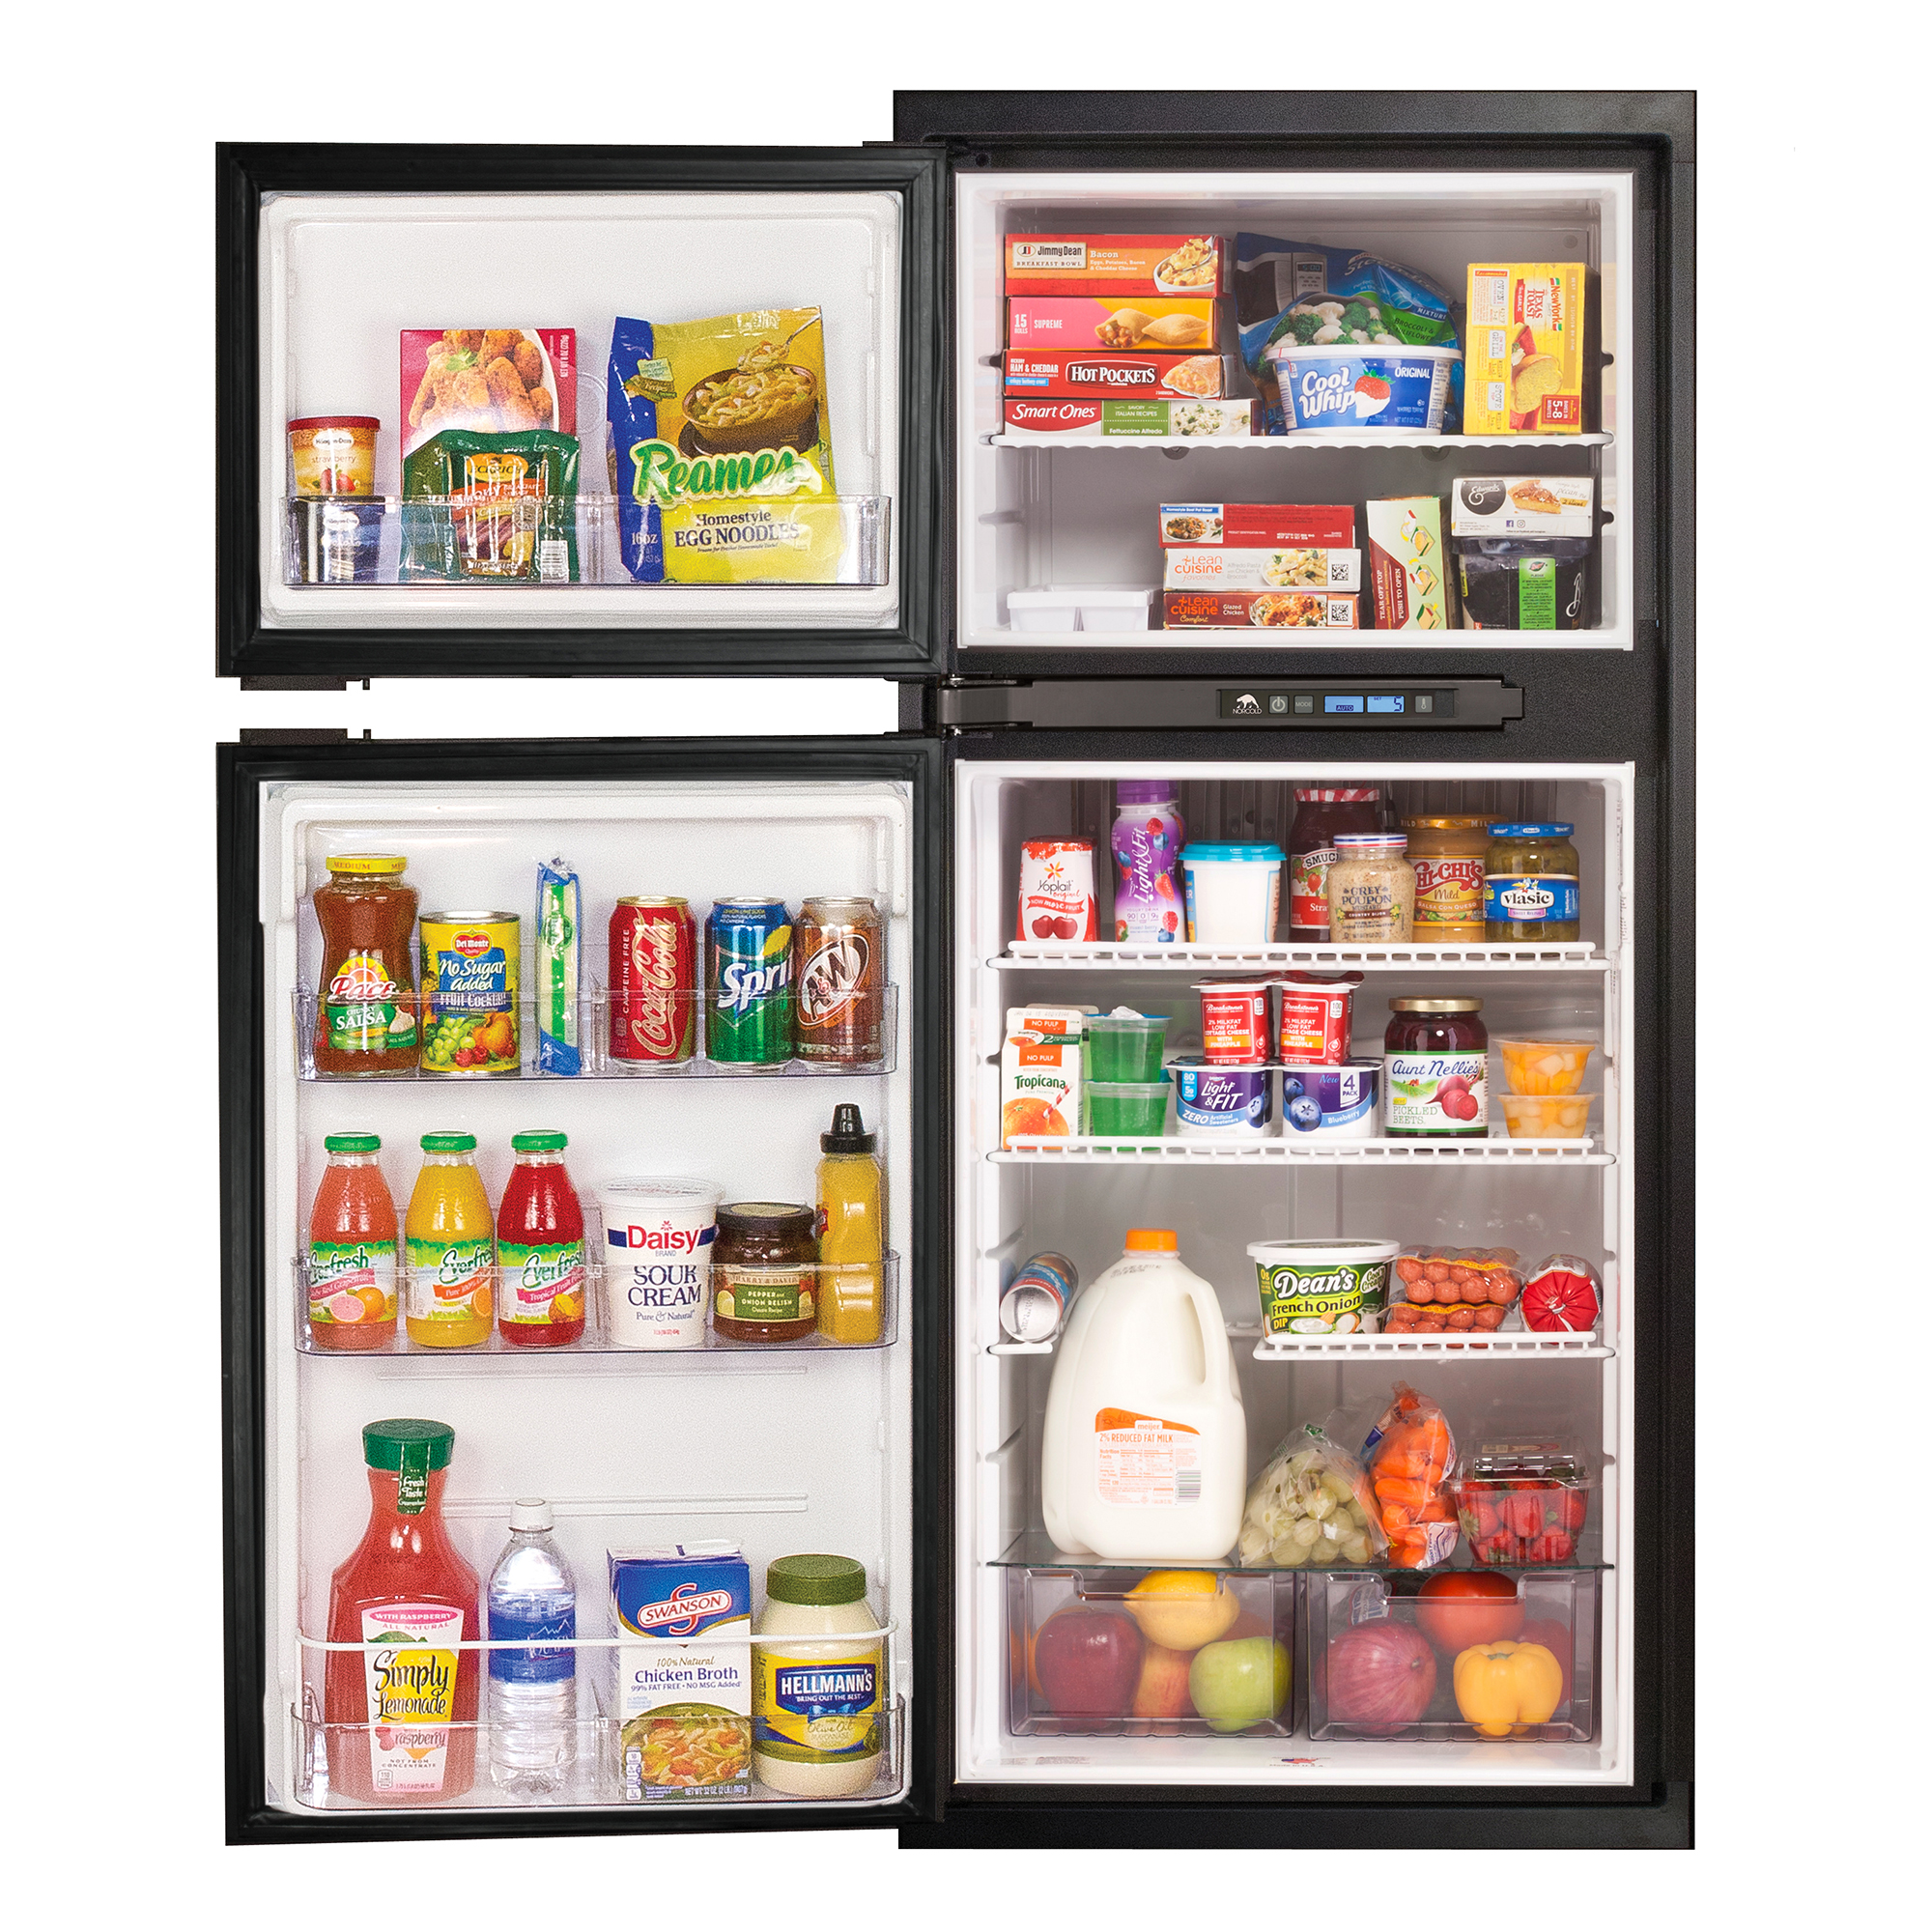 Norcold® Polar 7LX Refrigerator, 7 cu. ft. 2-way, Right Swing Door (NA7LXR) photo